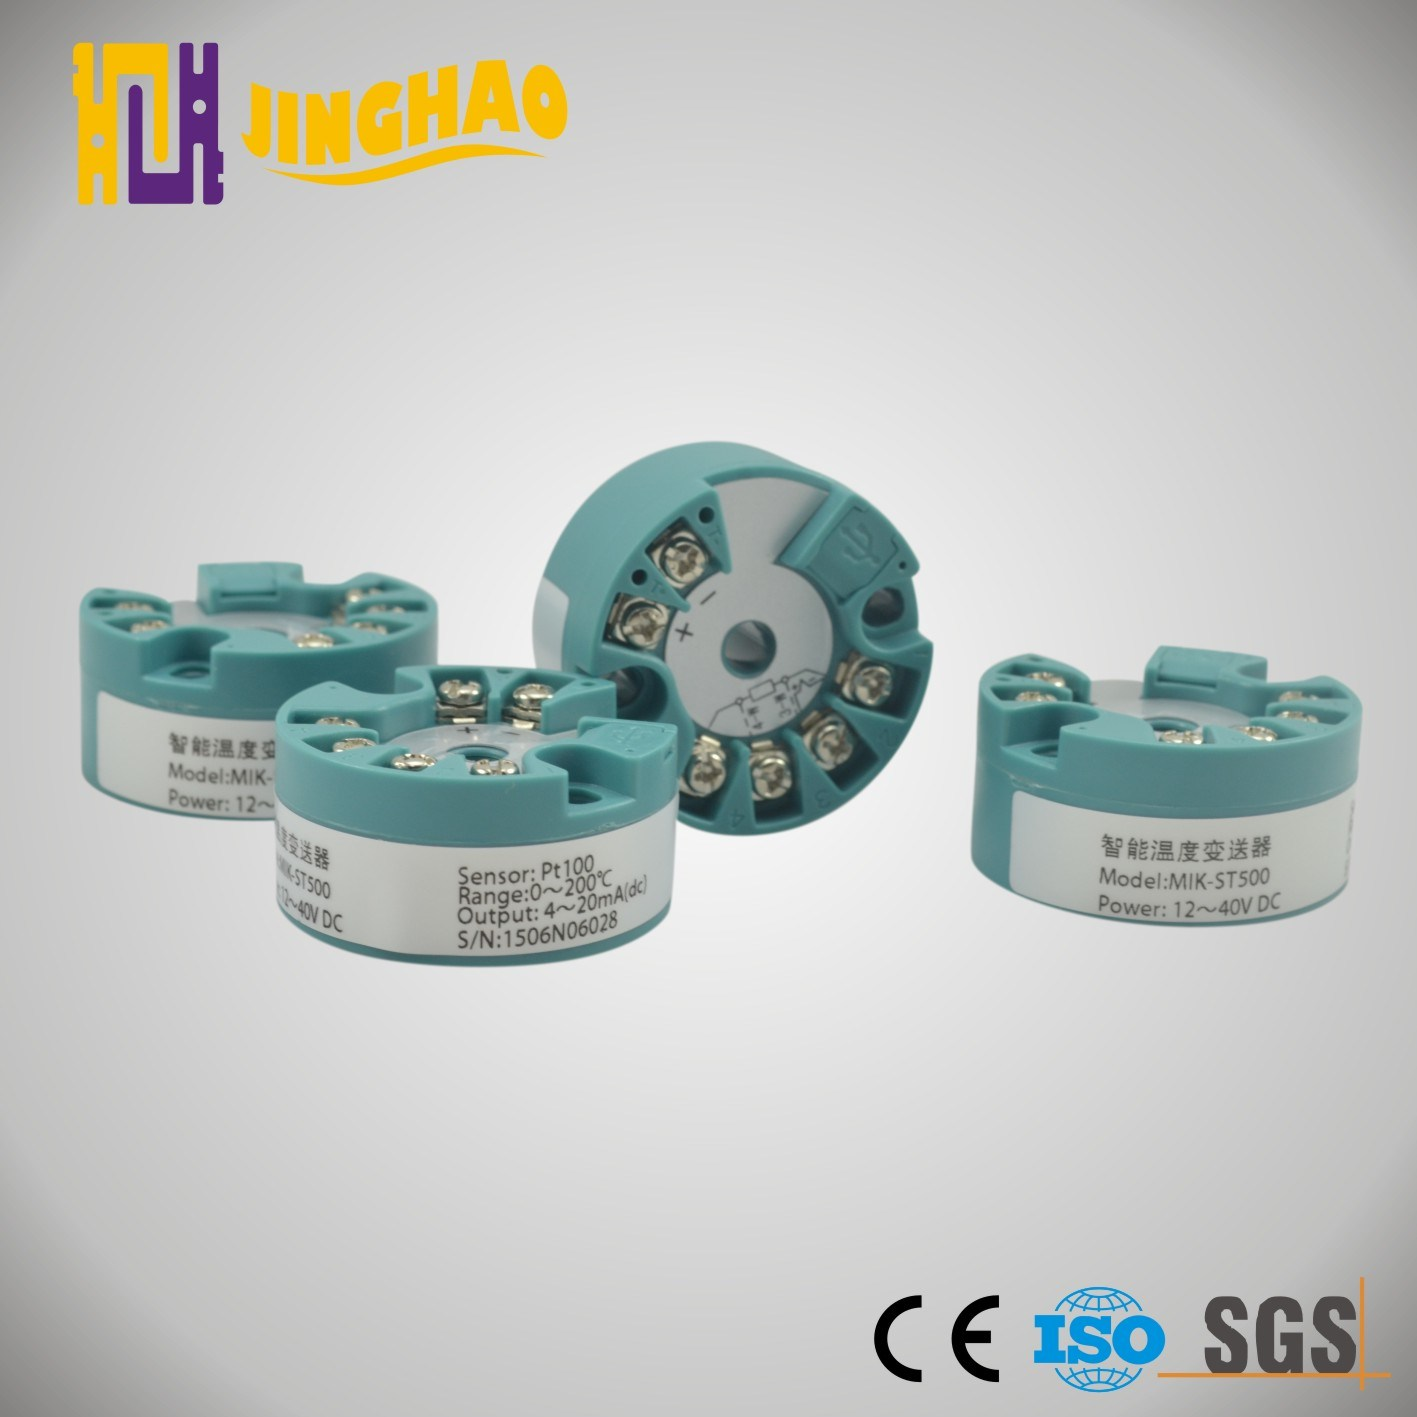 4-20mA PT100 Temperature Module/Integrated Temperature Transmitter